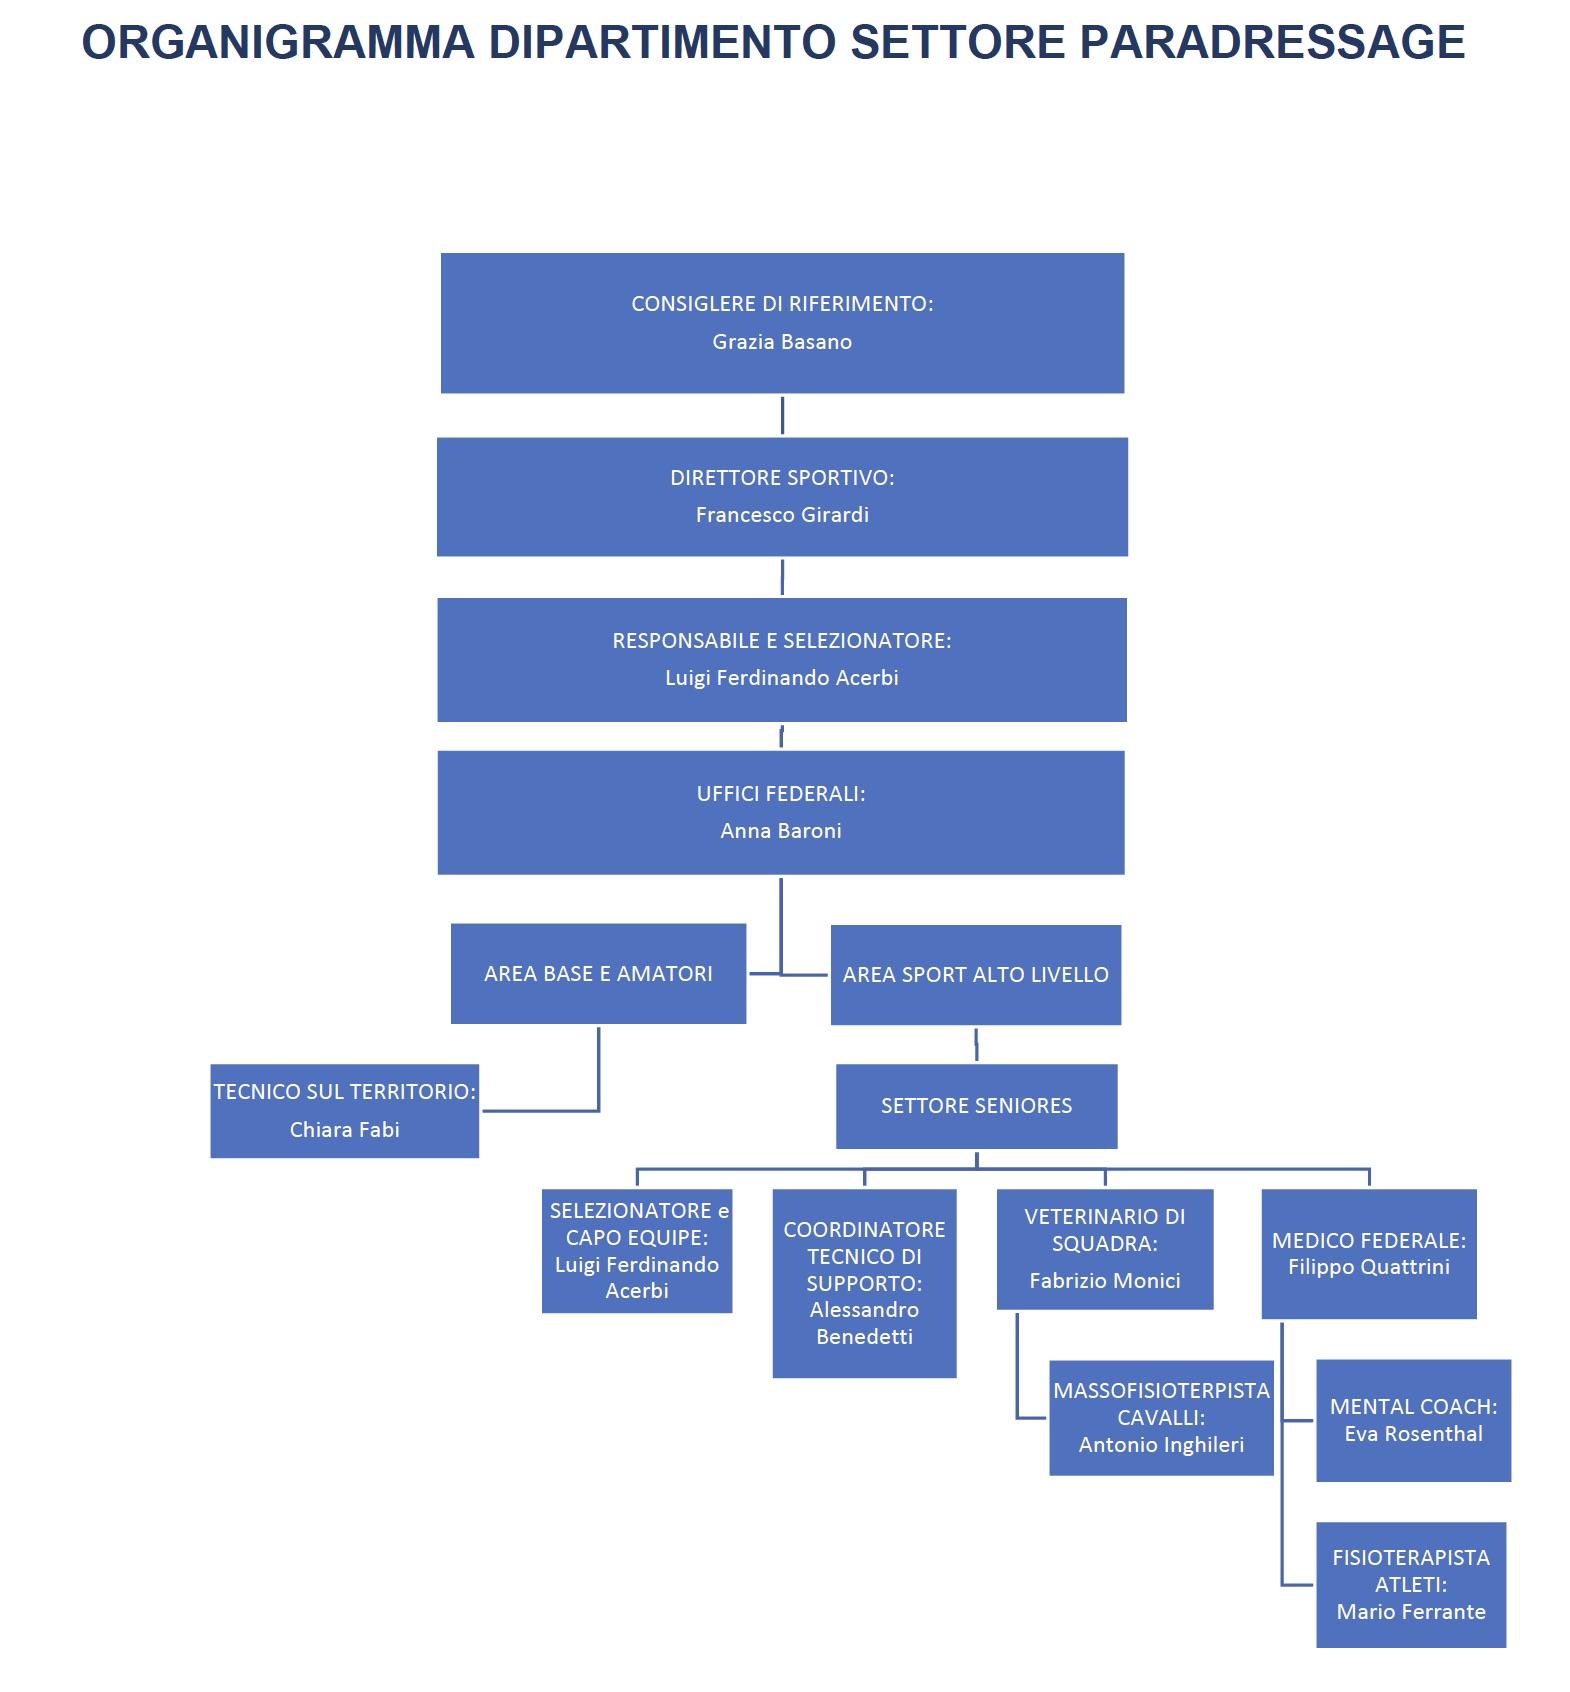 Organigramma Dipartimento Fise - Settore Paradressage 2020